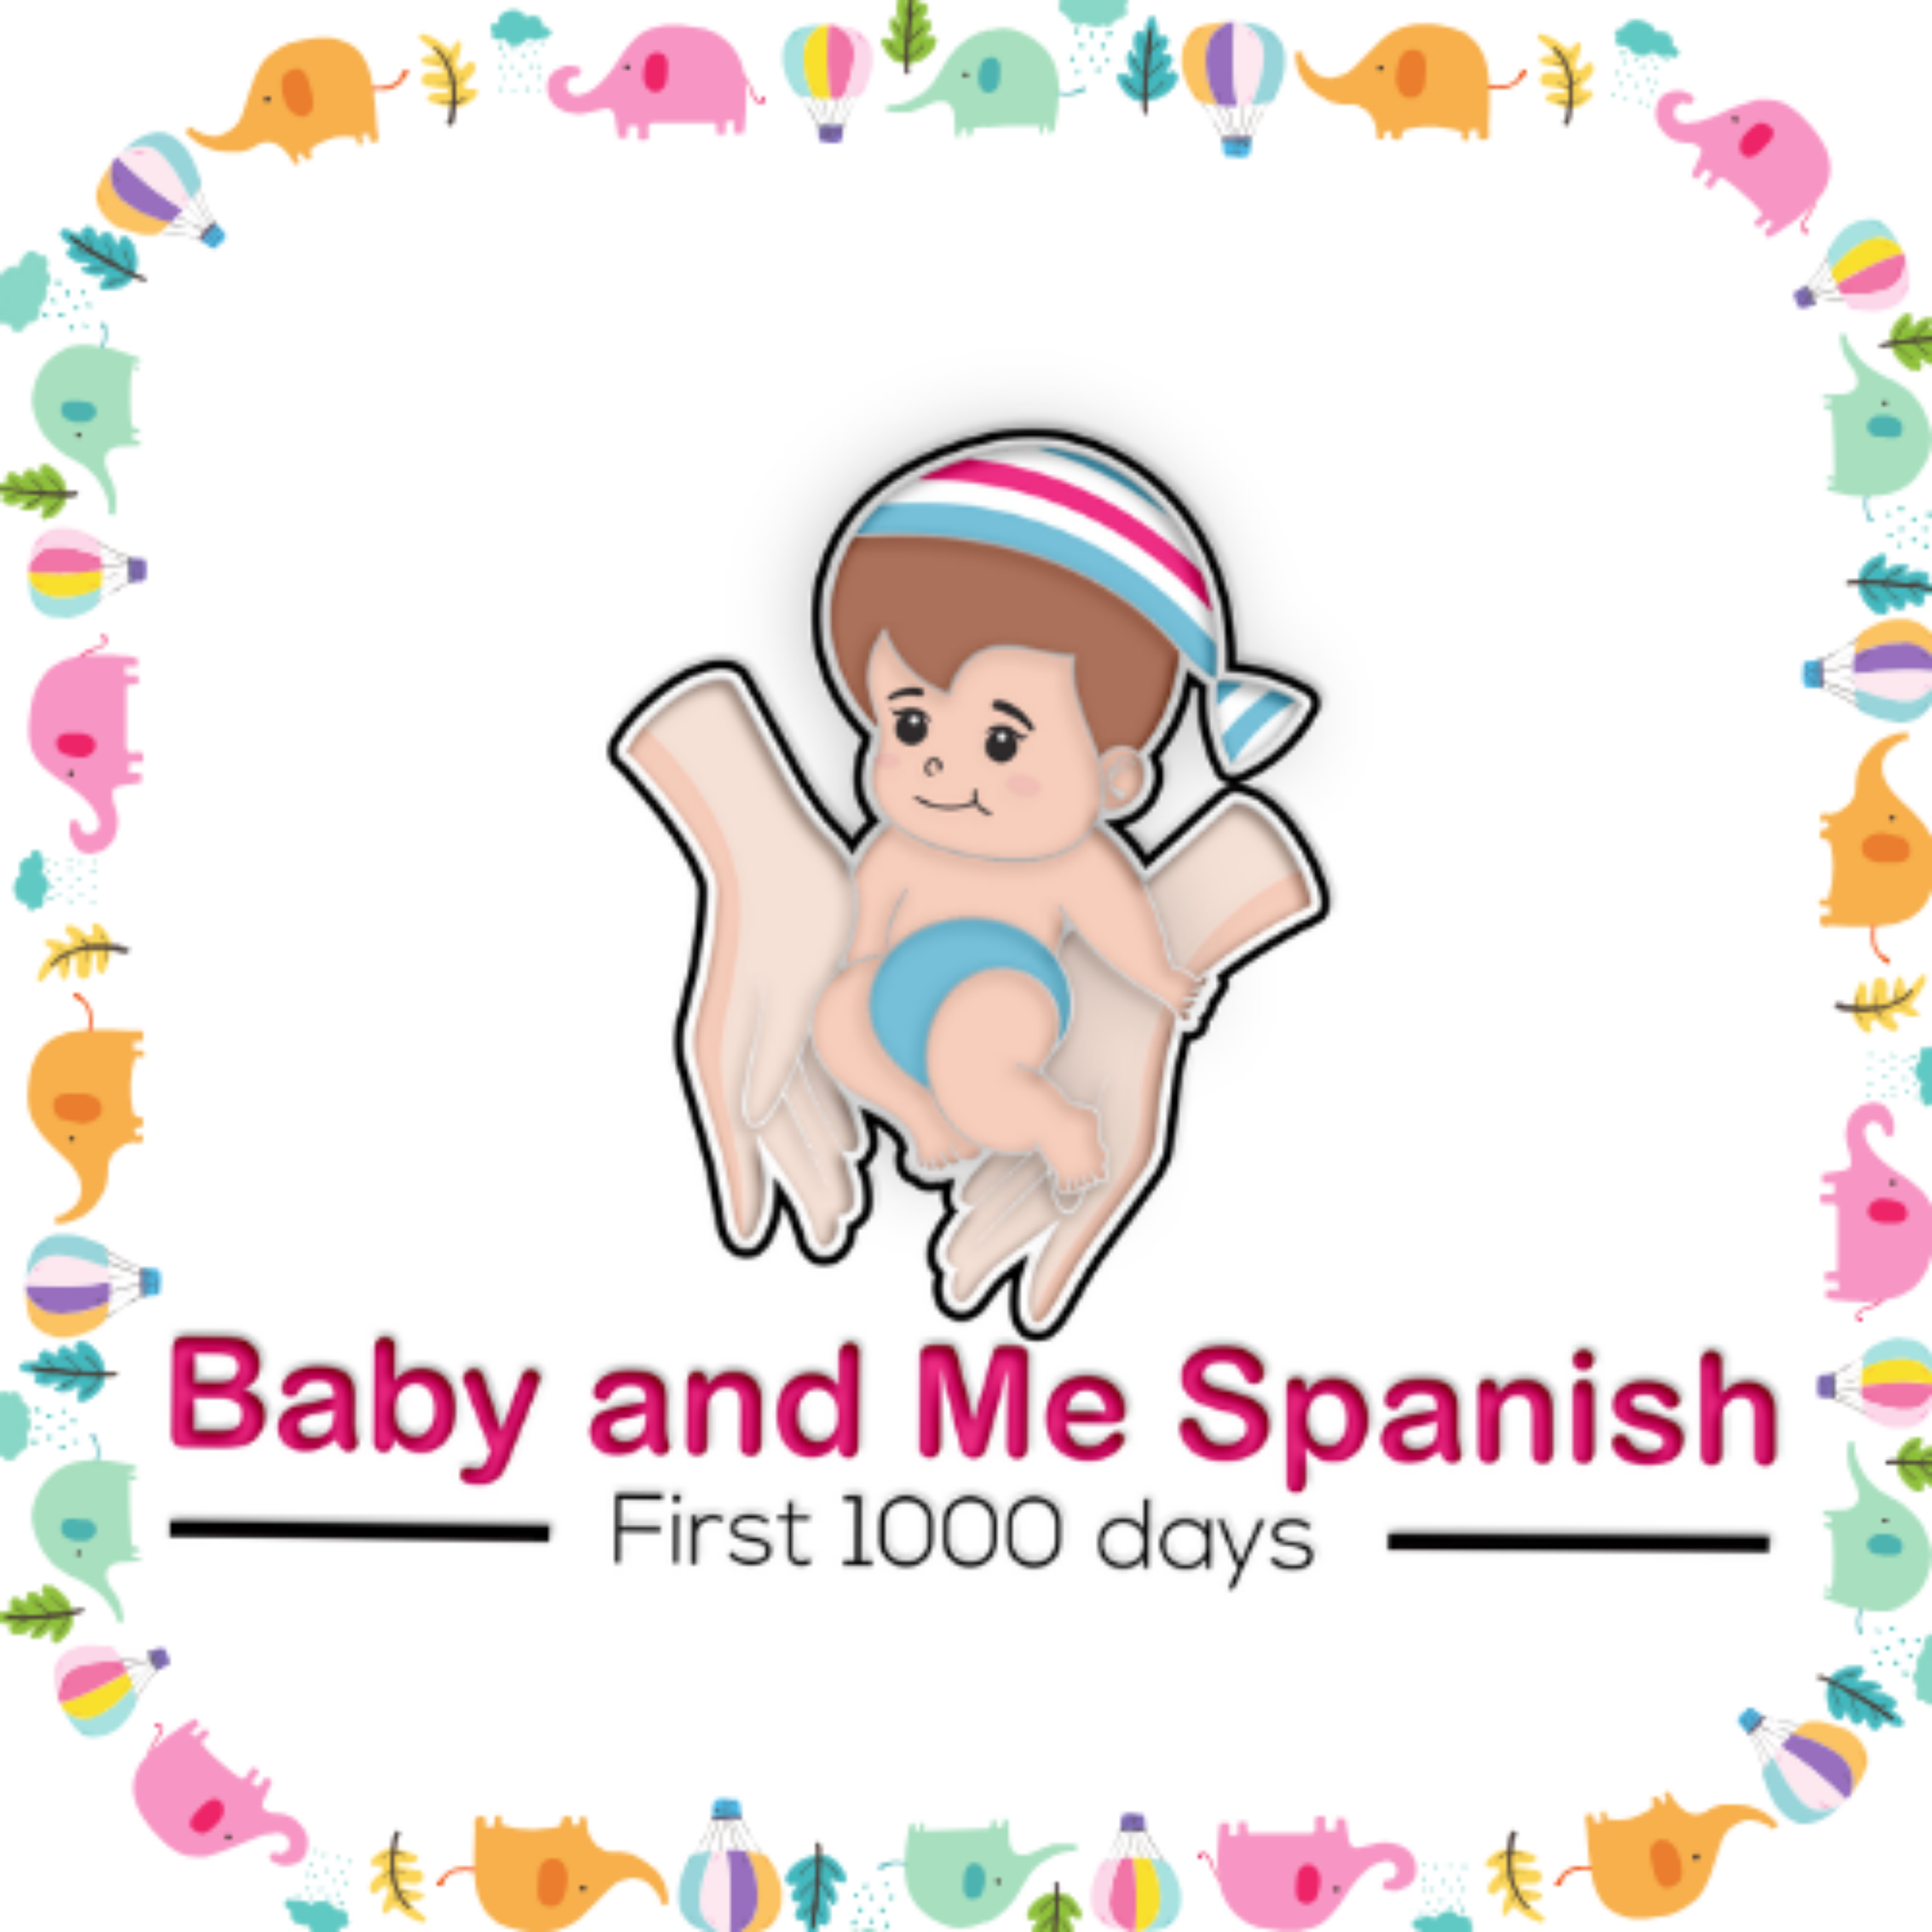 Baby and Me Spanish